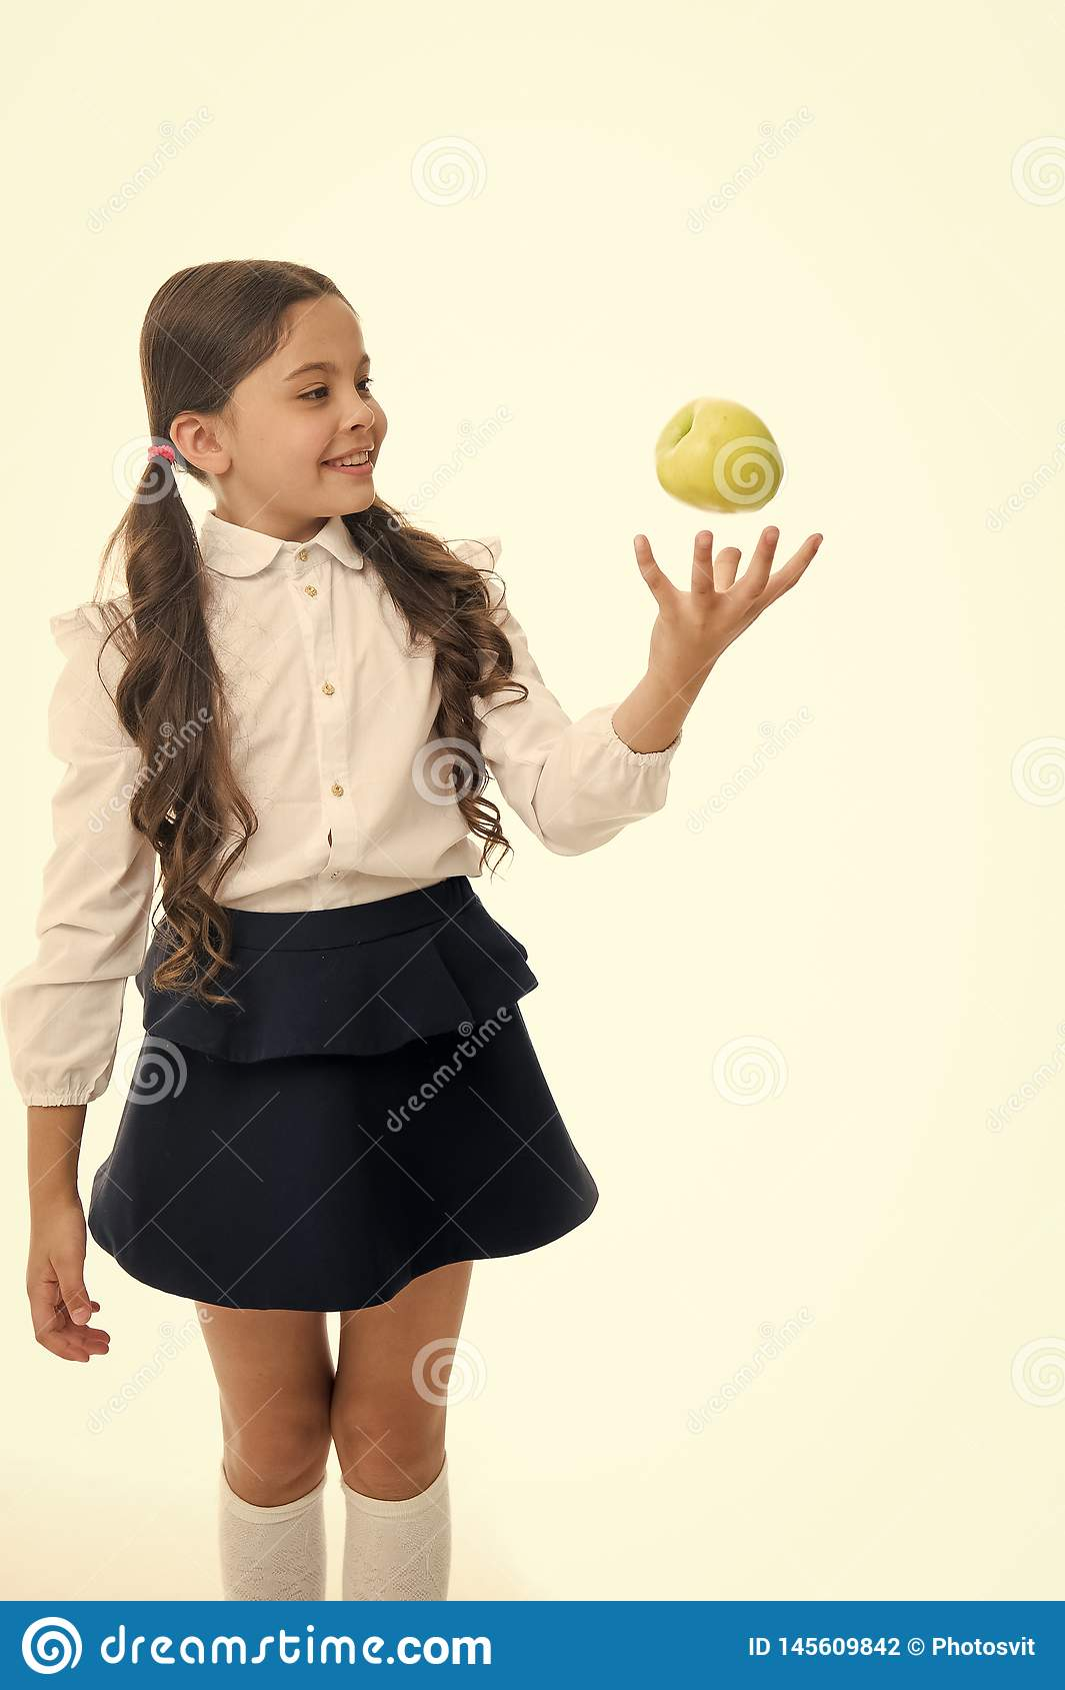 Child girl school uniform clothes toss apple. Girl cute pupil holds apple fruit white background. Child smart kid